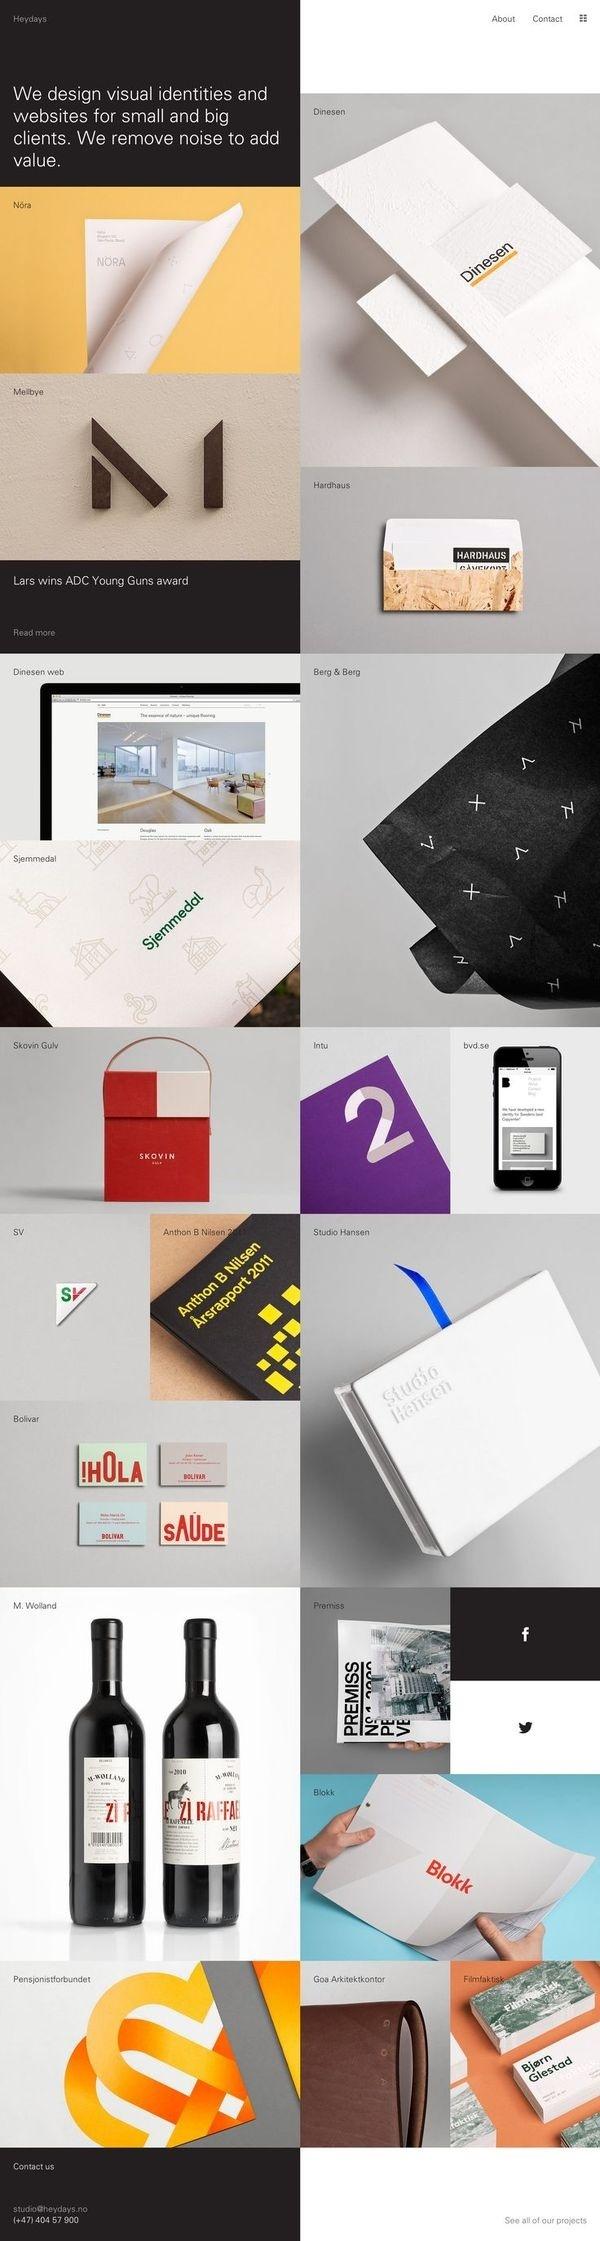 http://heydays.no/ #design #web #webdesign